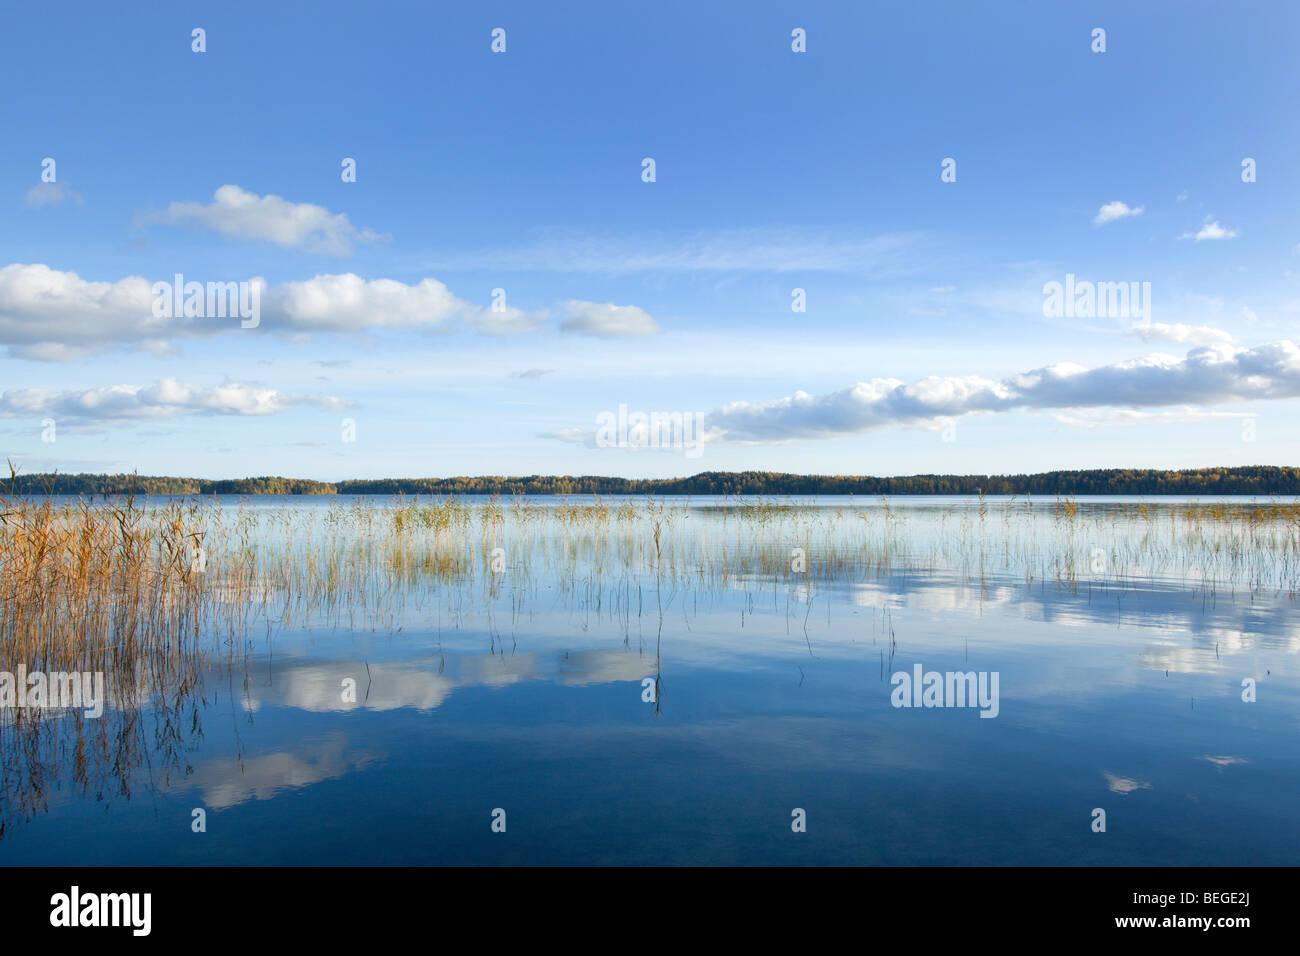 Lake Vitträsk in Finland - Stock Image